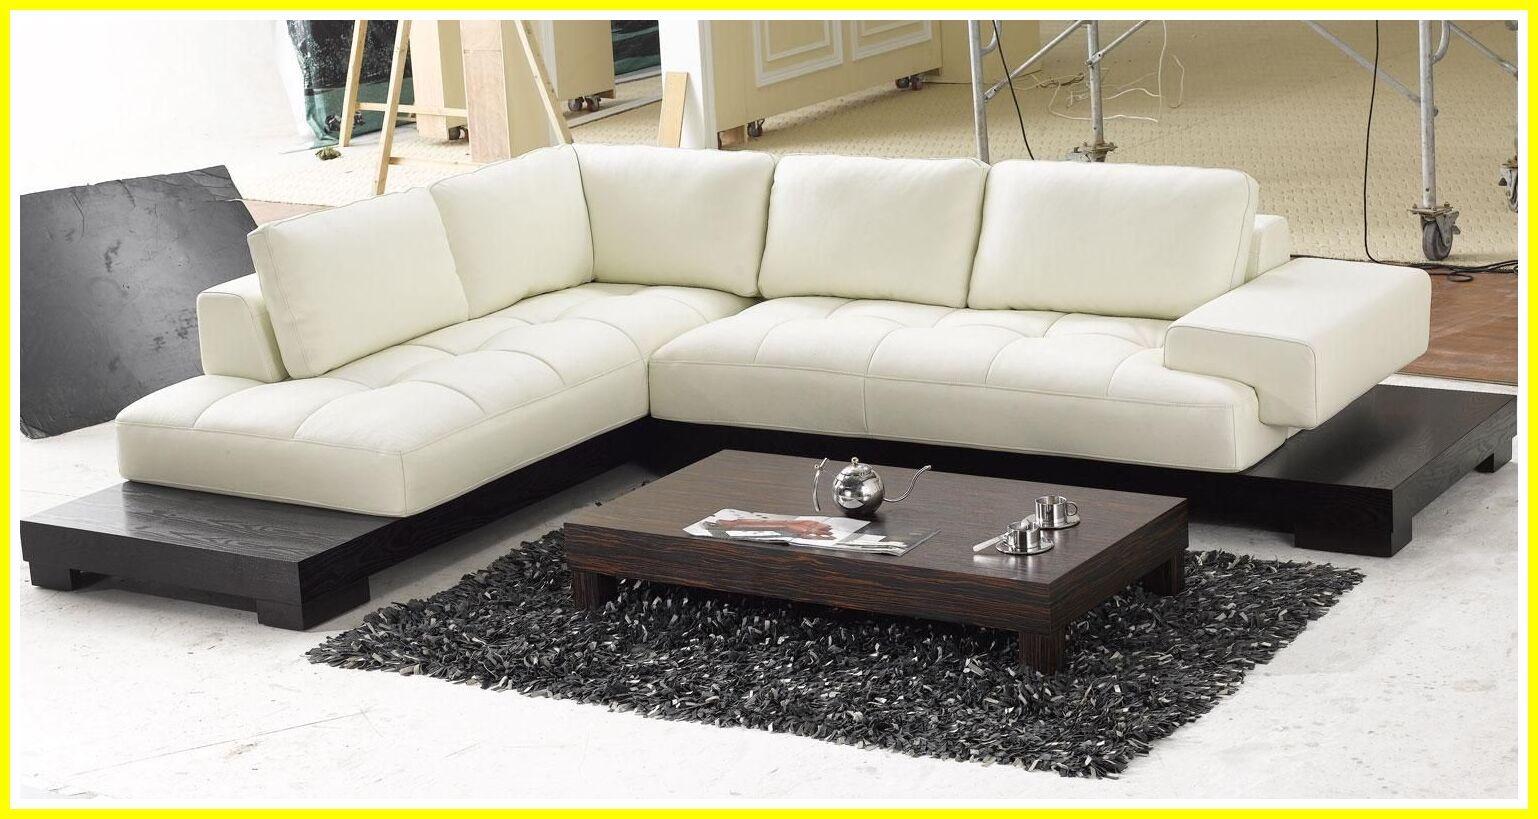 Contemporary Sofa X2f Fabric X2f 3 Seater X2f Reclining Moving Valmori Contemporary Sofa Reclining Sofa Modern Sofa